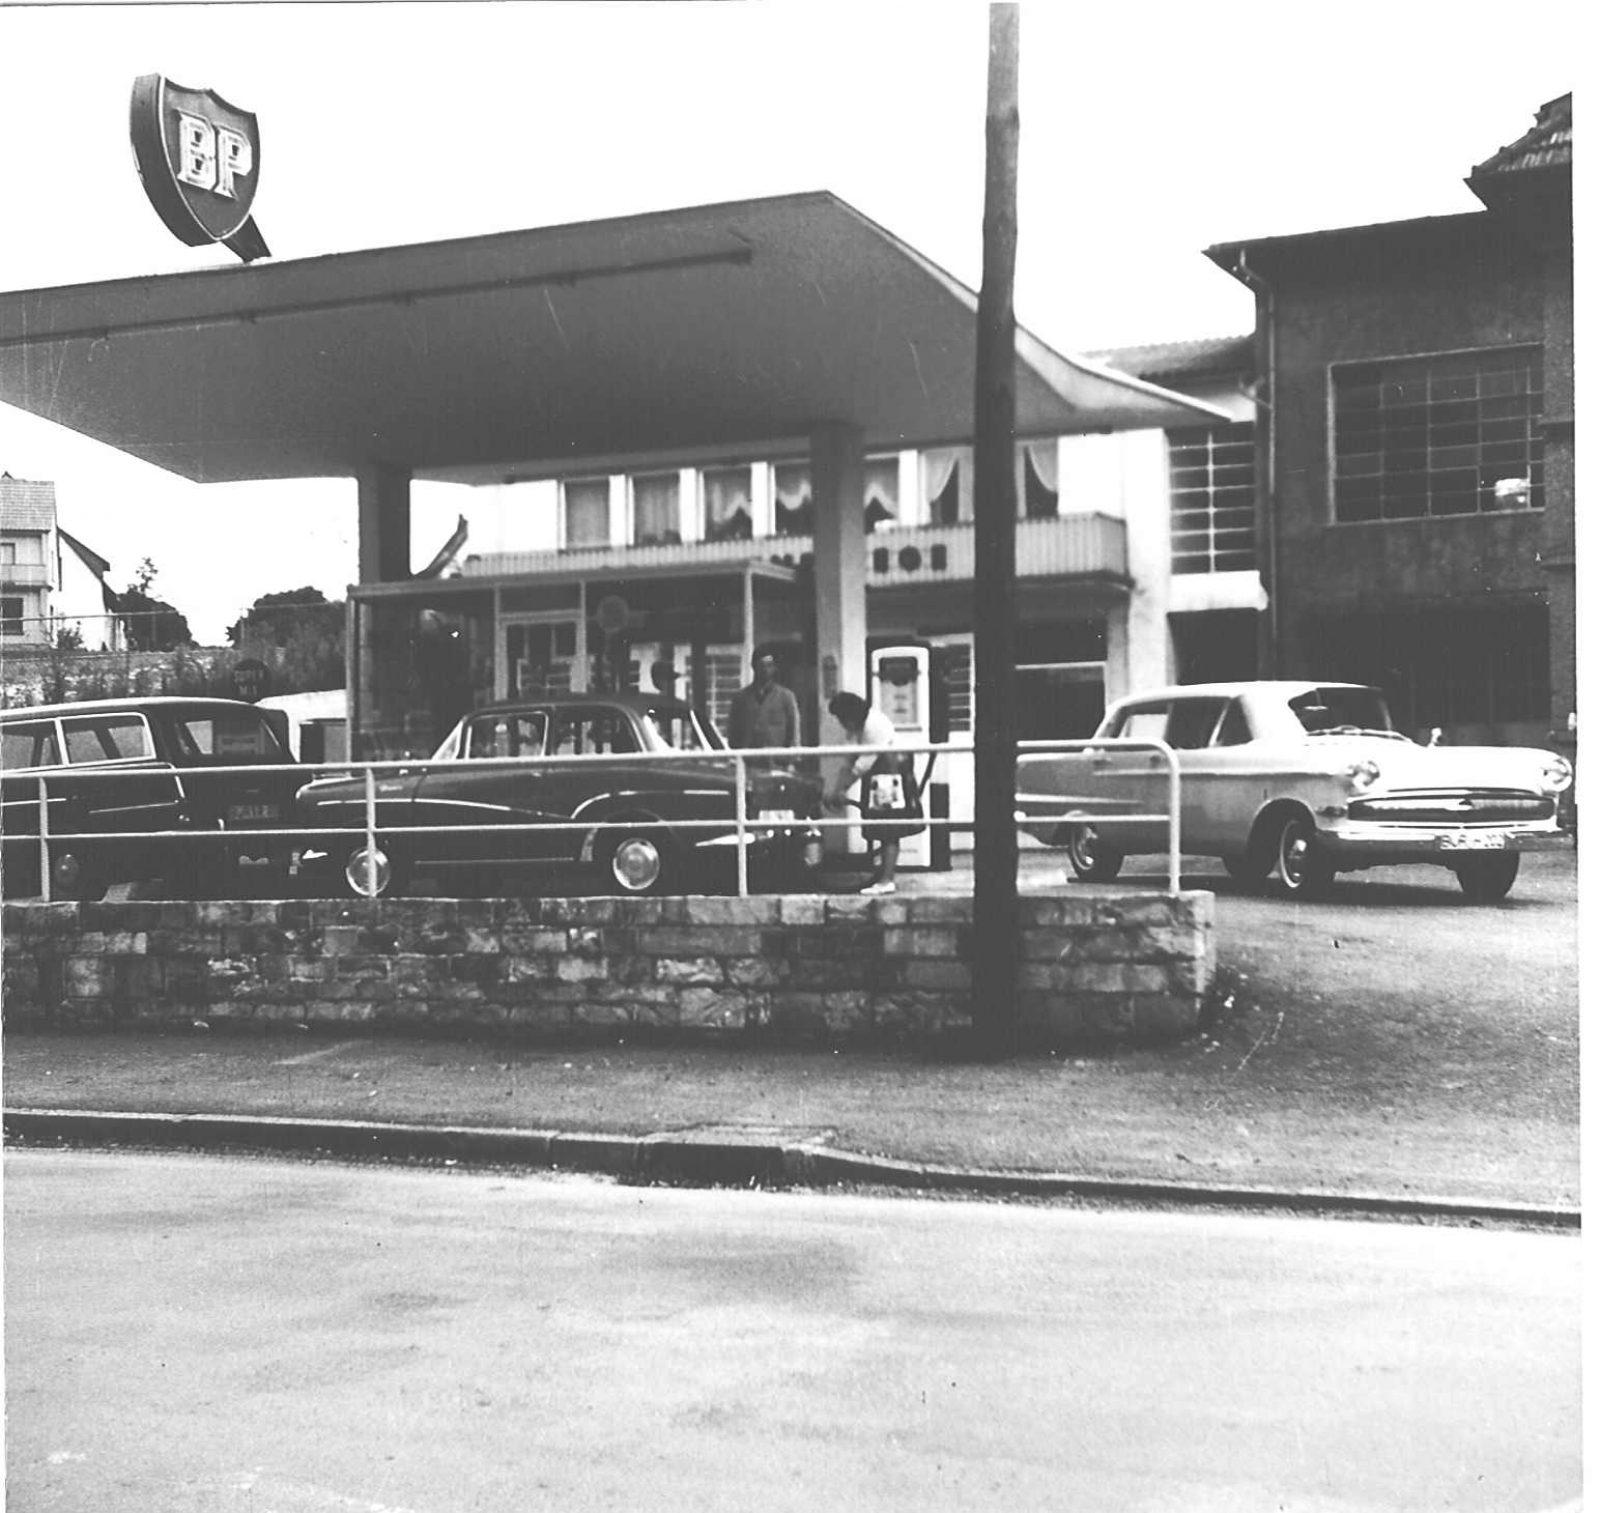 BS 1965 Sobizack BP-TS von Holthaus